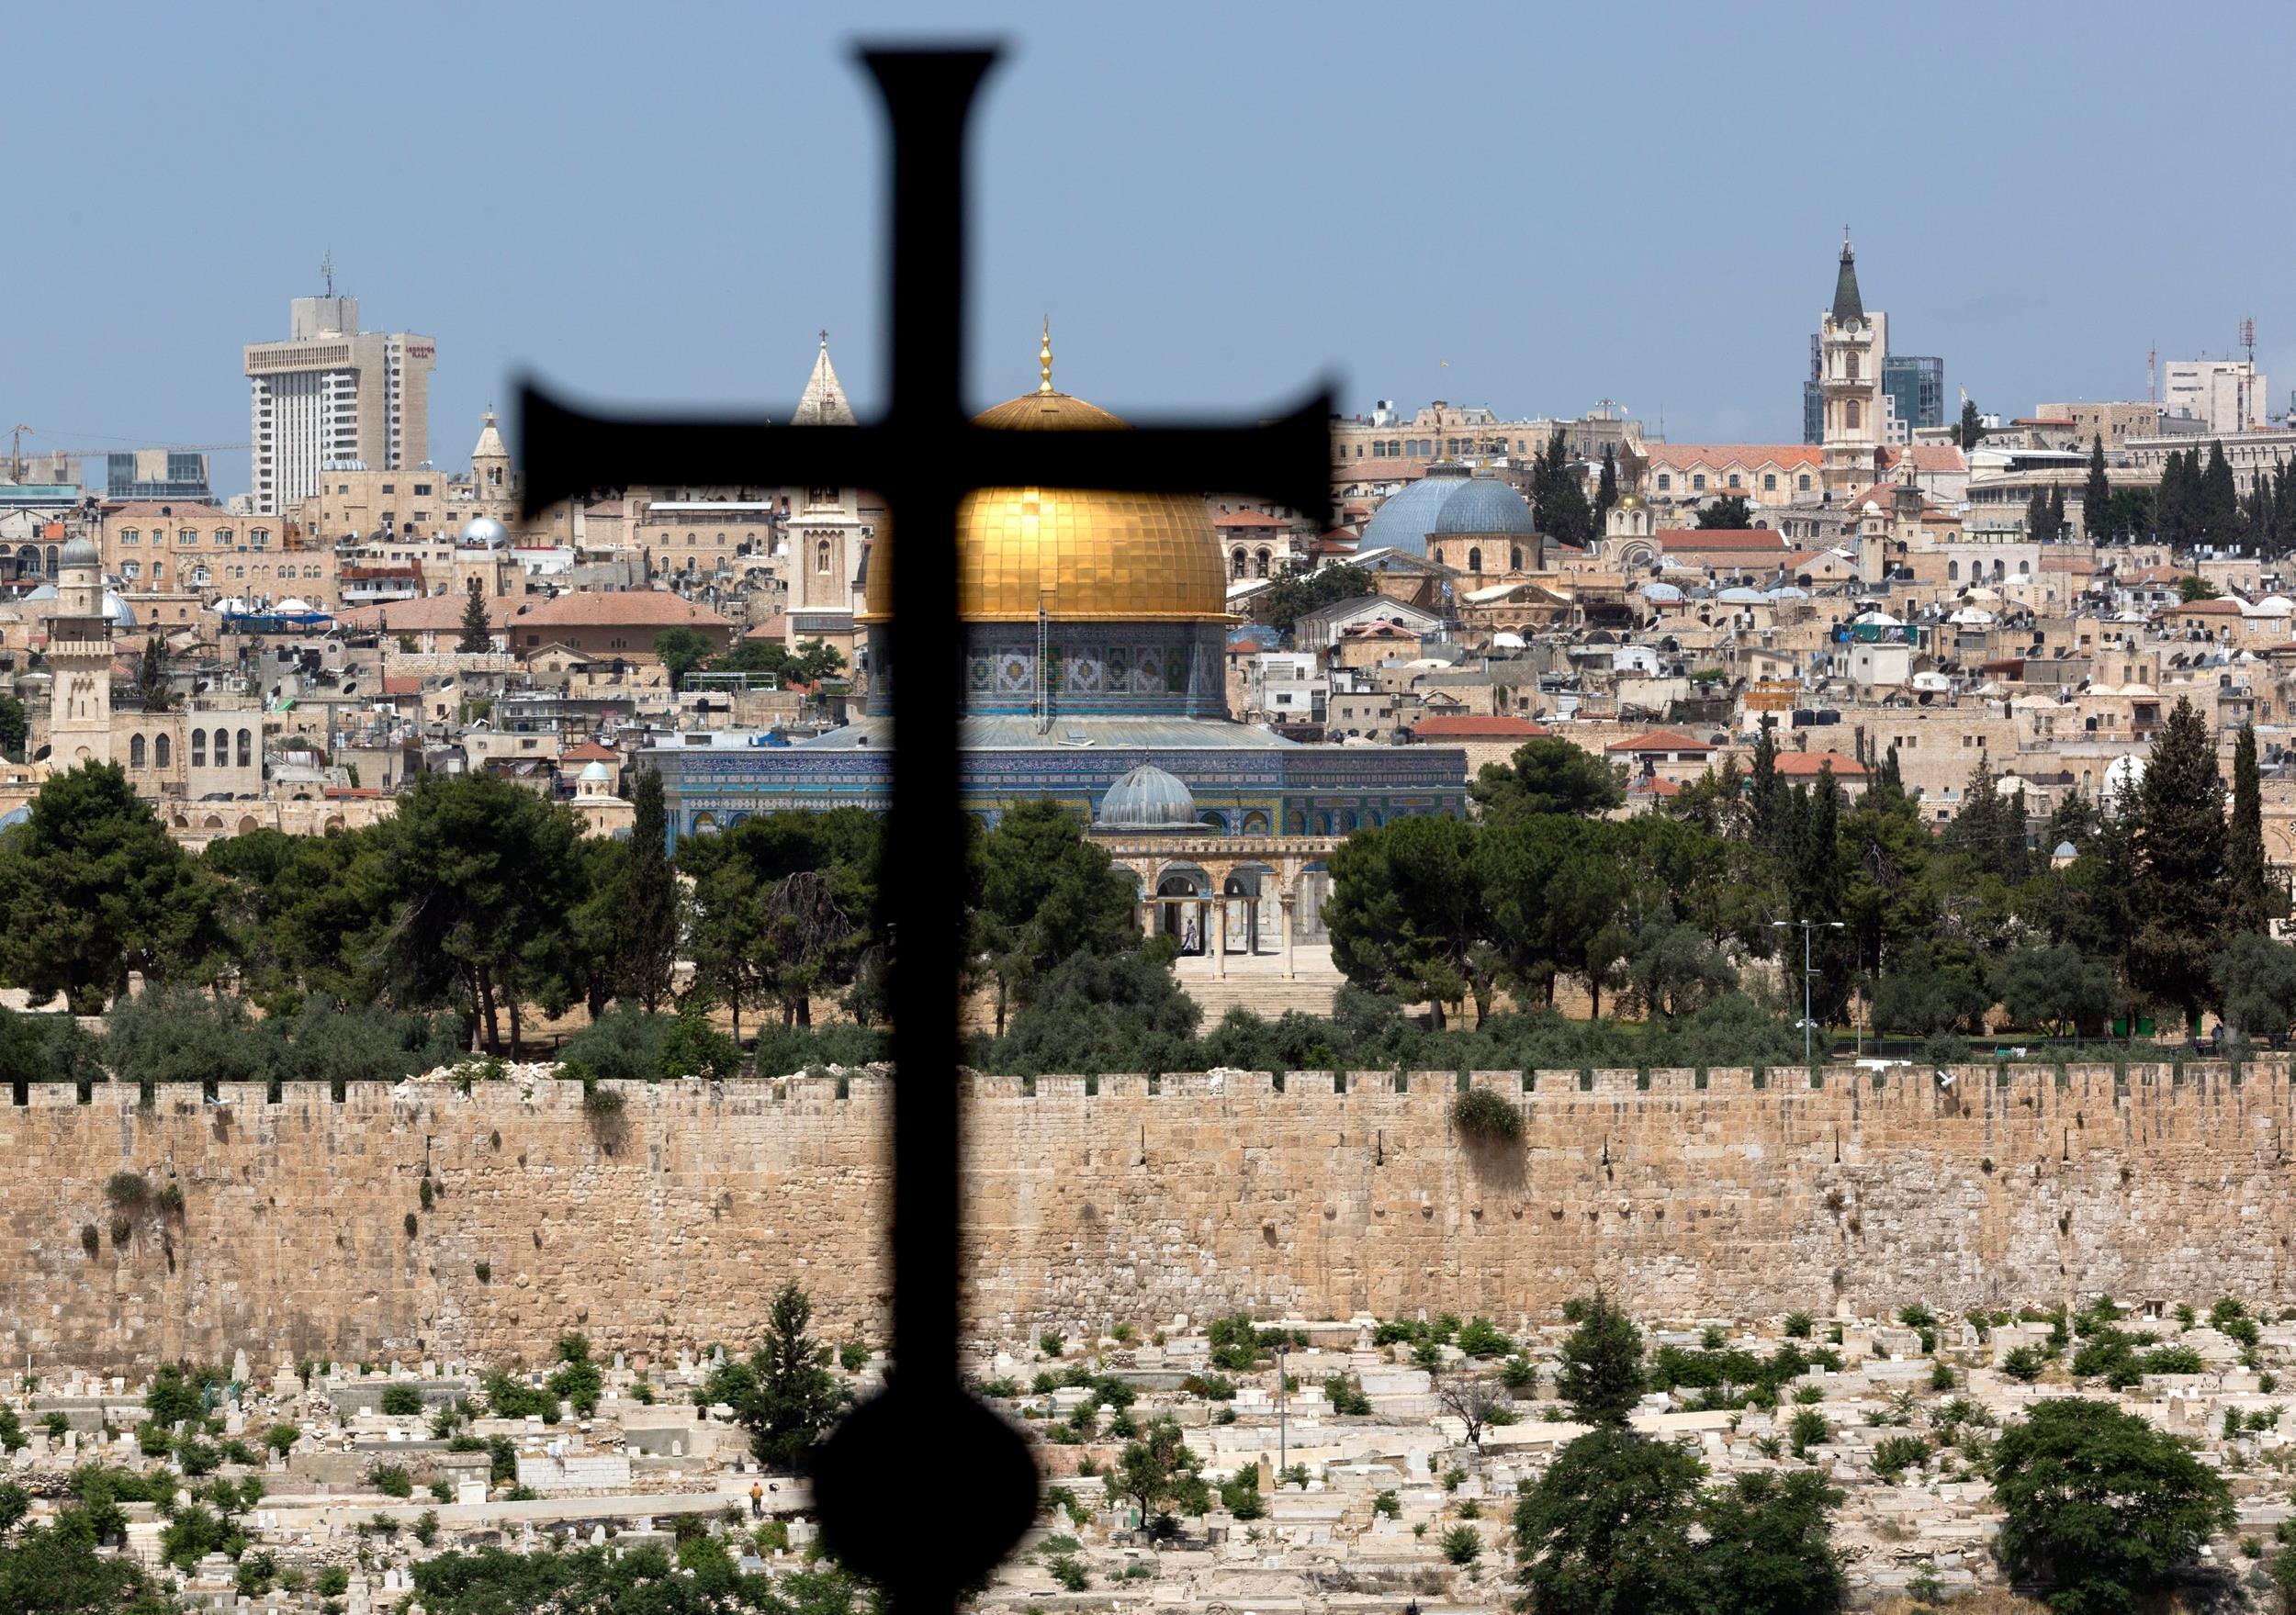 140523-israel-pope-main_72fb1a6d082ff114fca973ebdfb18703